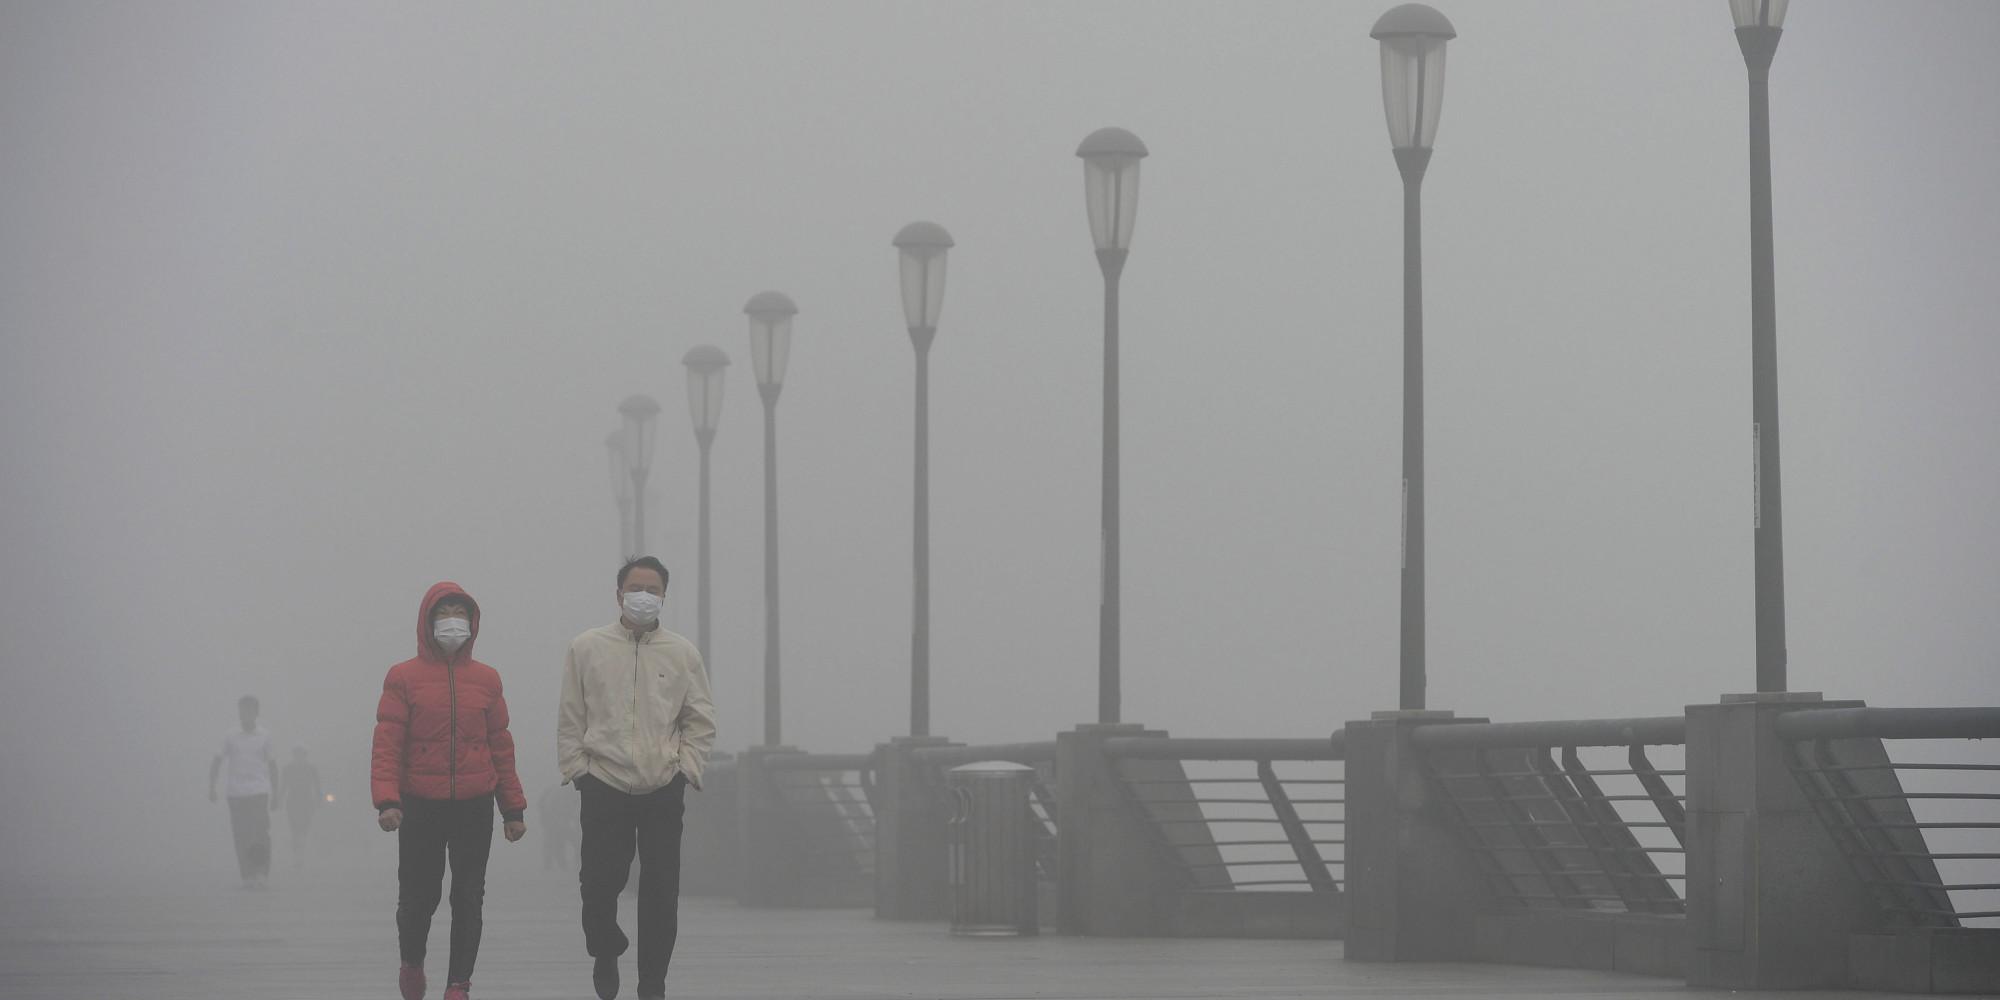 china, China pollution, Shanghai, world, smog